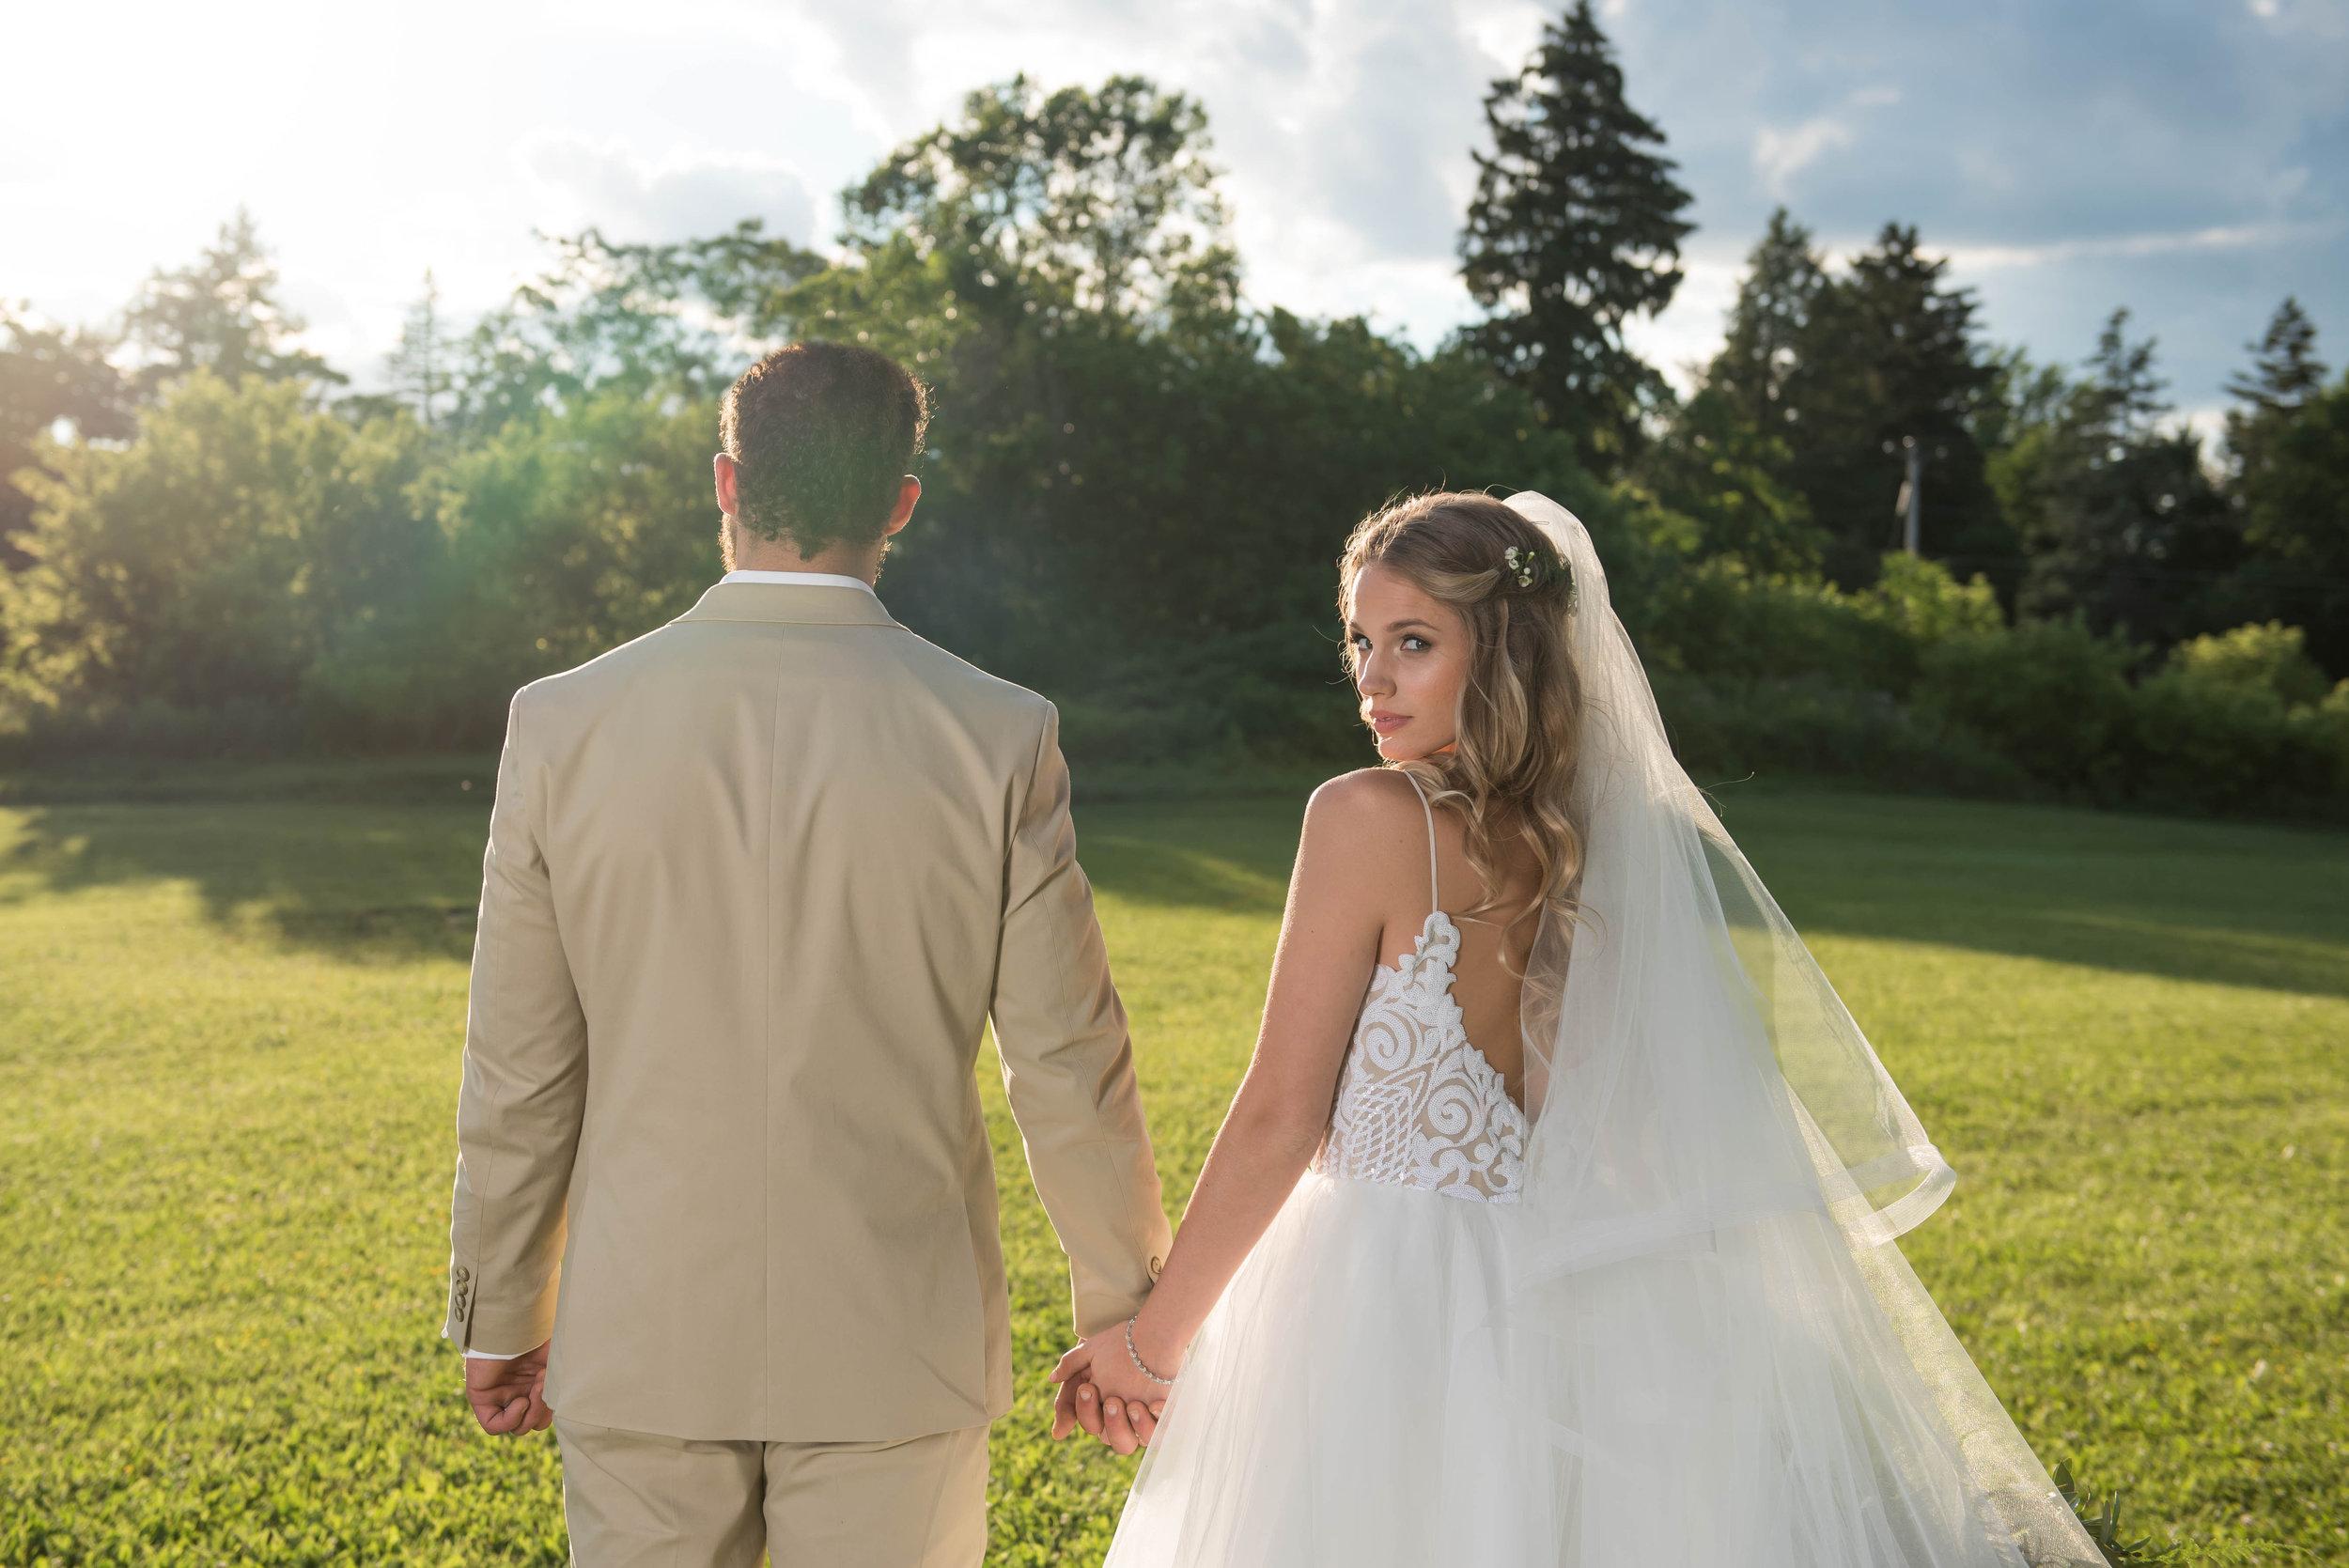 Cleveland Makeup Artist Karin Dodge Airbrush Bridal Weddings